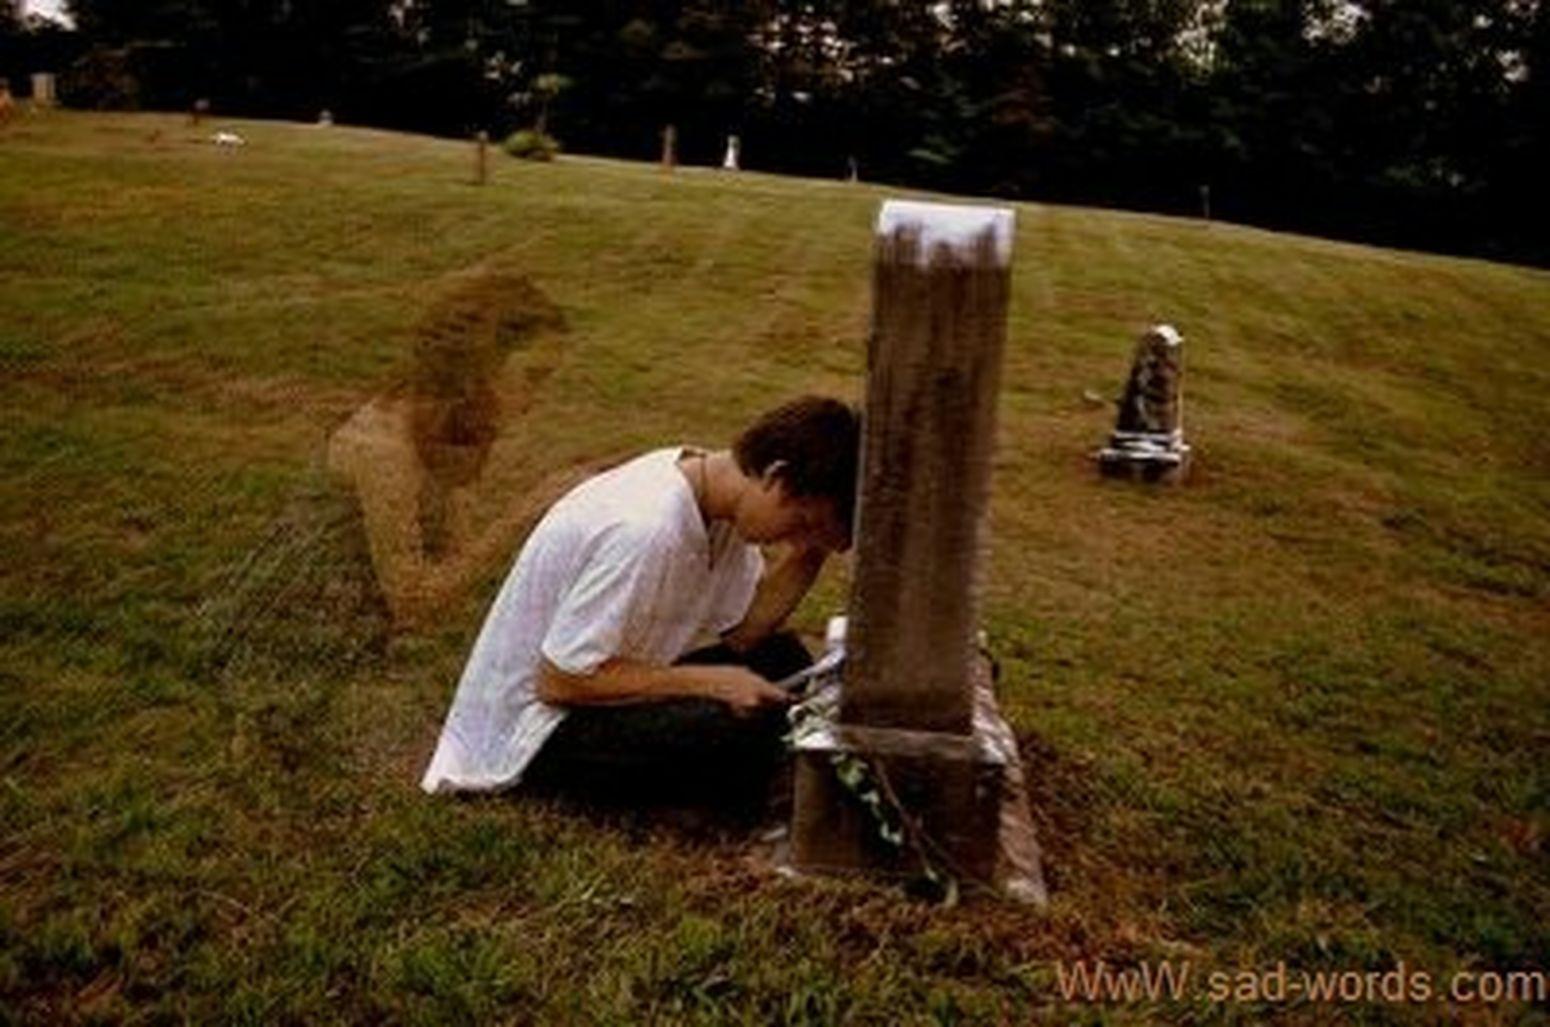 Relaxing Sad :( Dead Leaves Aşk♥ I Don't Realy Know How To Use This Acılar ölüm